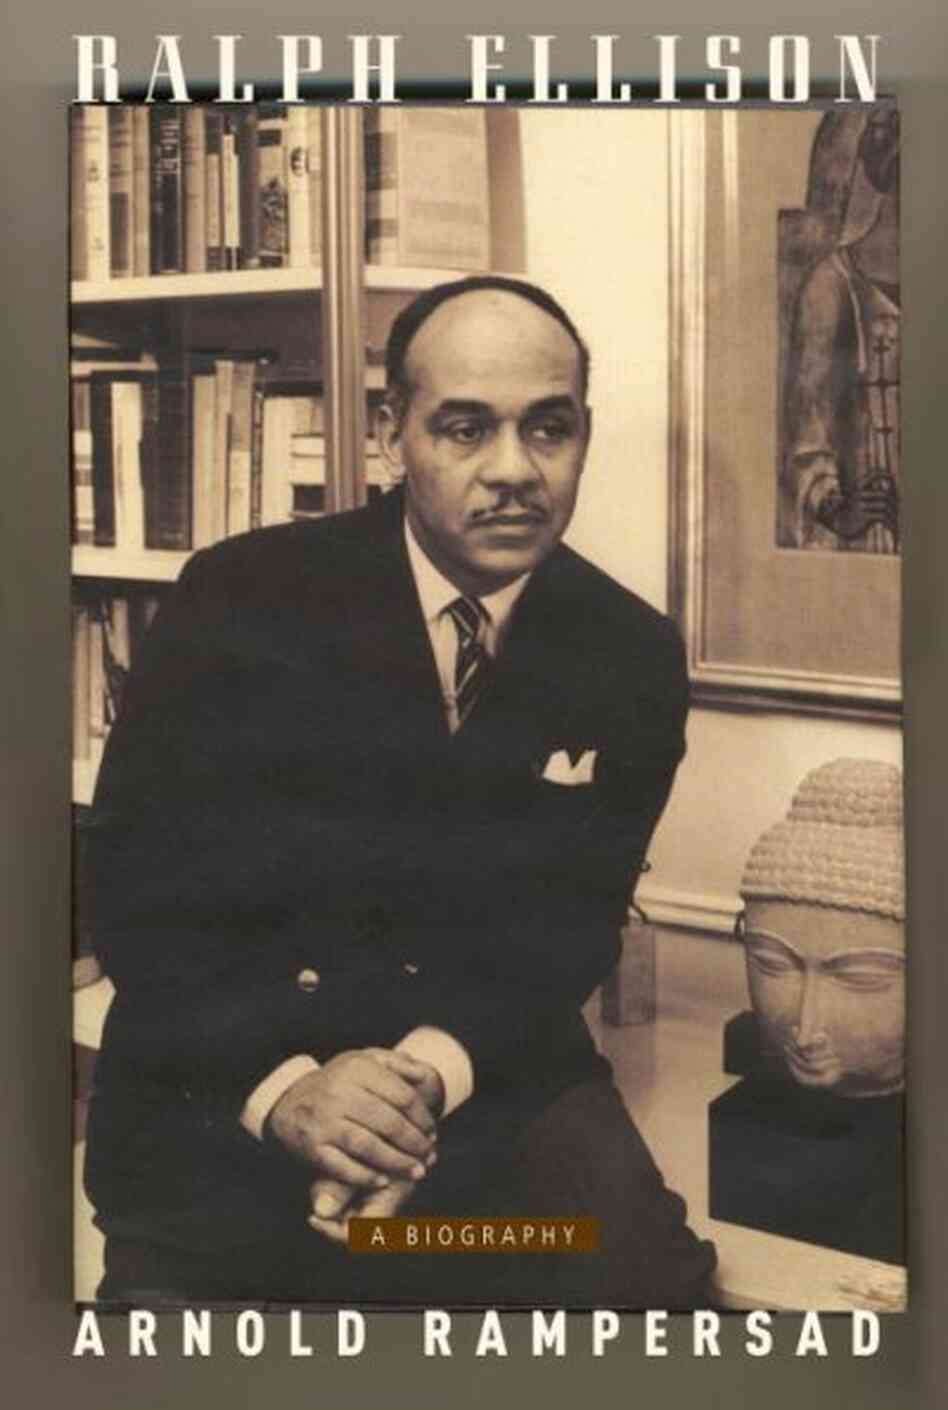 Ralph ellison biography